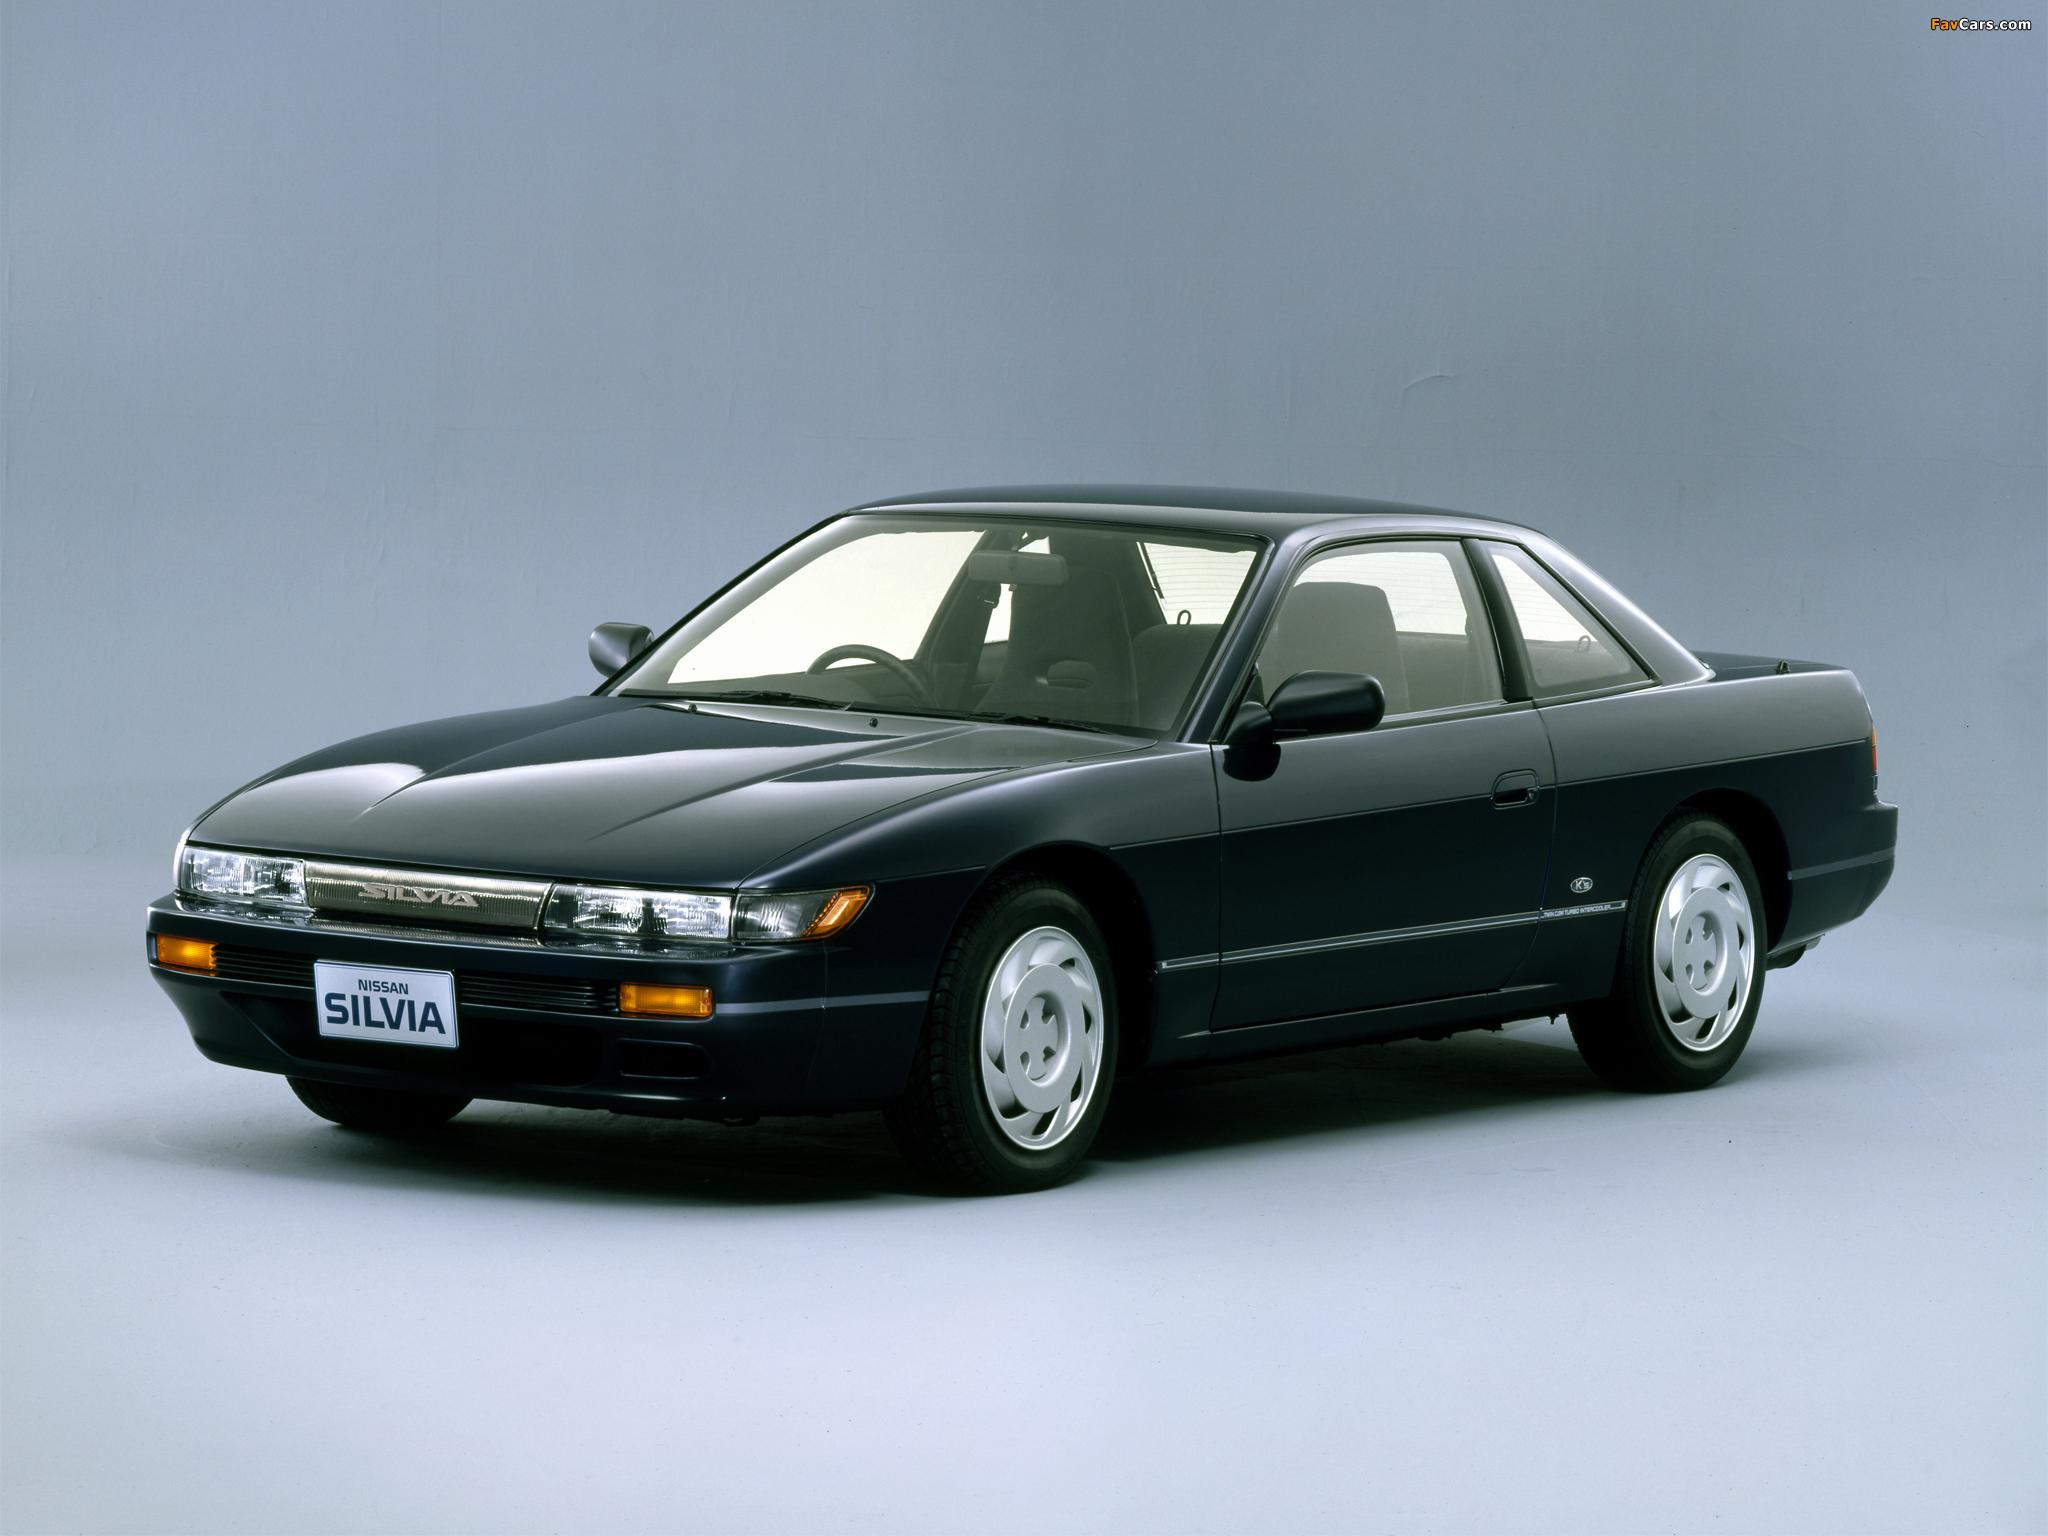 Nissan Silvia Ks S13 1988 93 Images 2048x1536